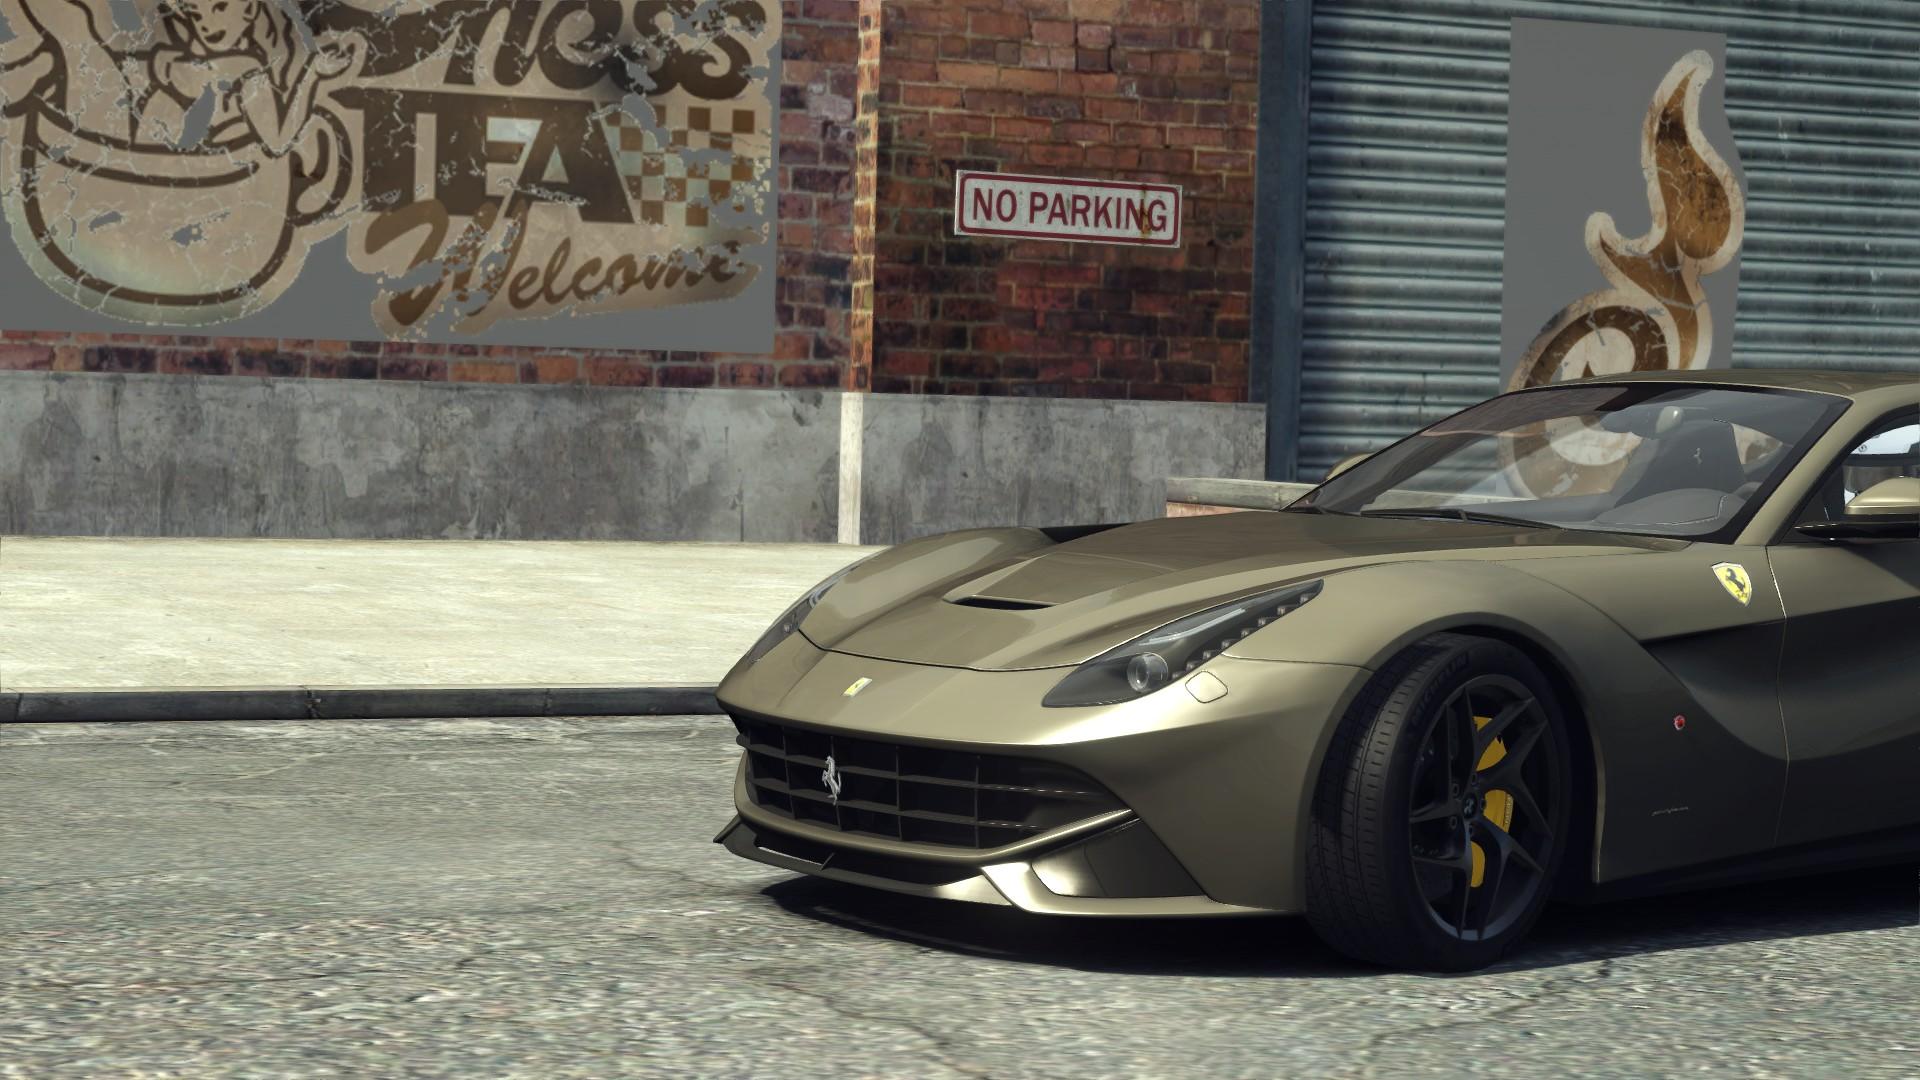 Ferrari F12 Berlinetta Assetto Corsa 1.15.x 011.jpg